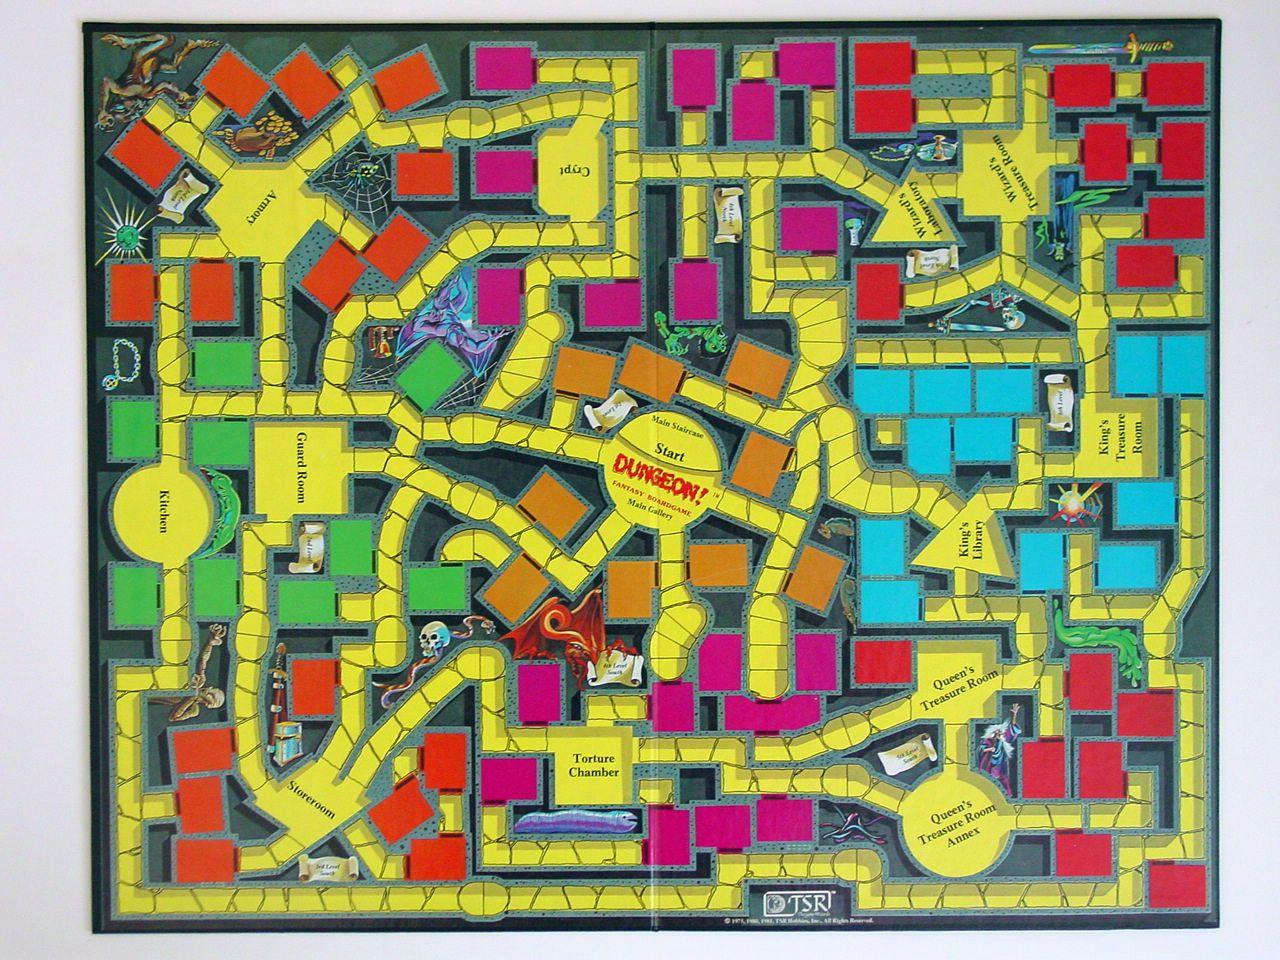 Dungeon! Board Game Board